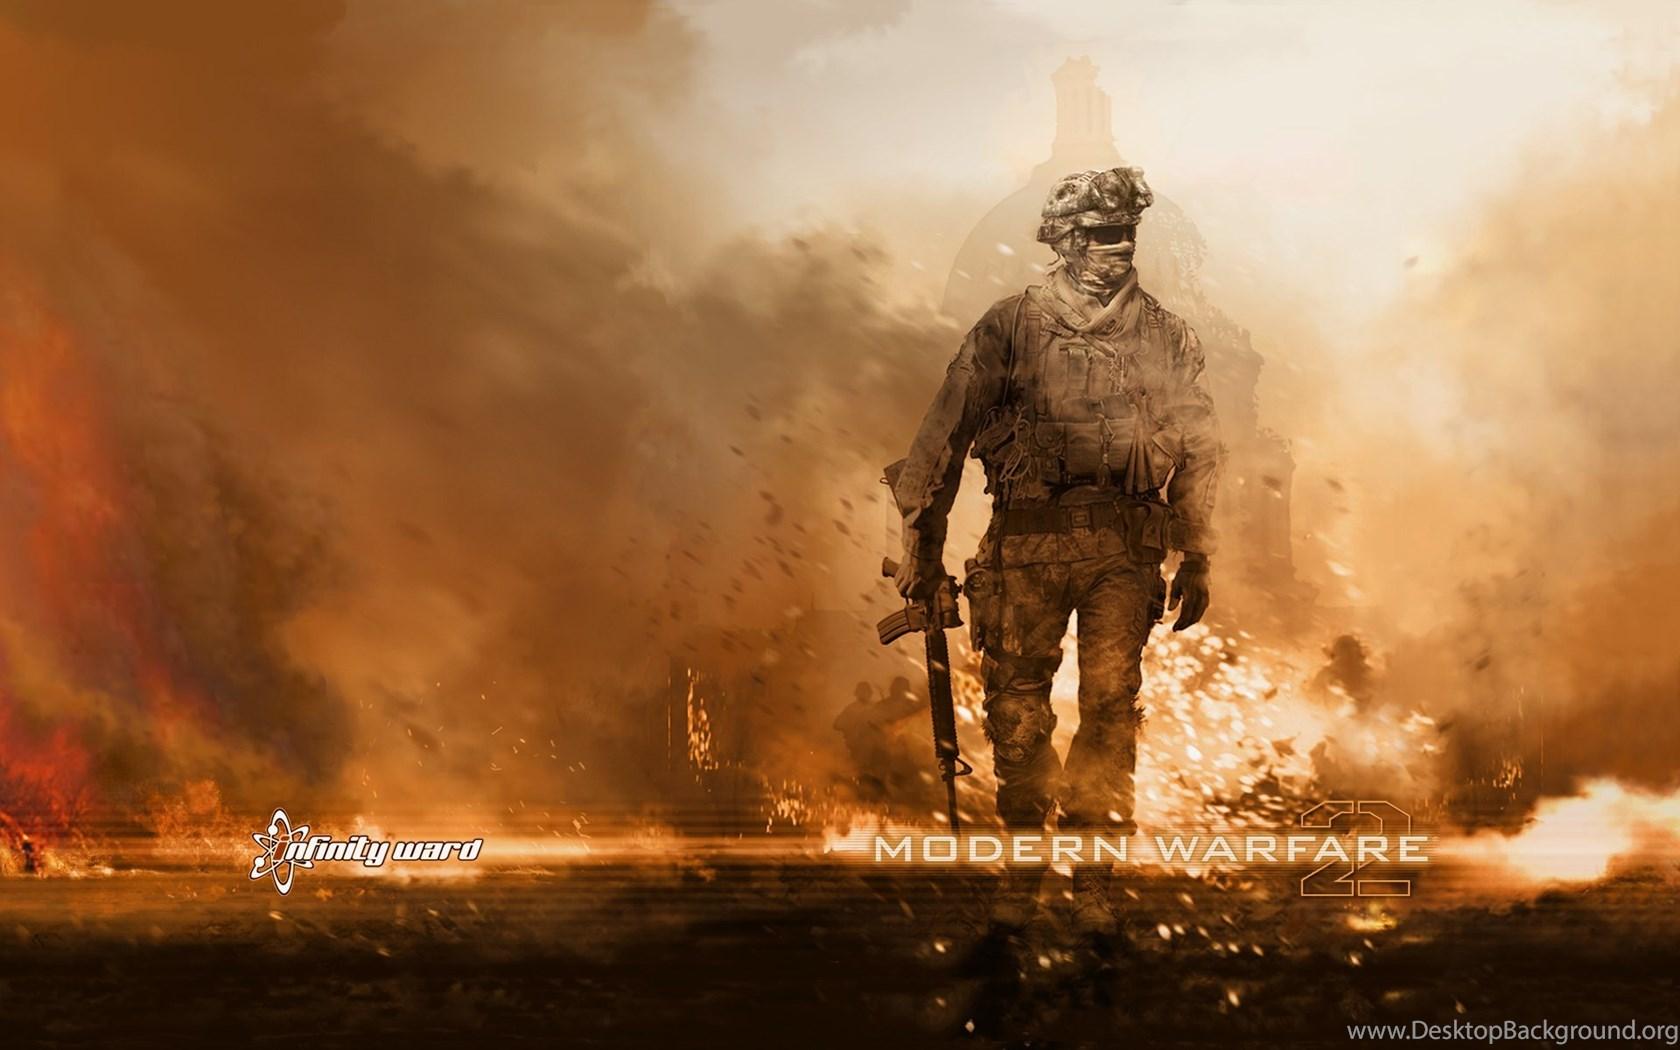 Call Of Duty Modern Warfare 2 PC Games Wallpapers Desktop